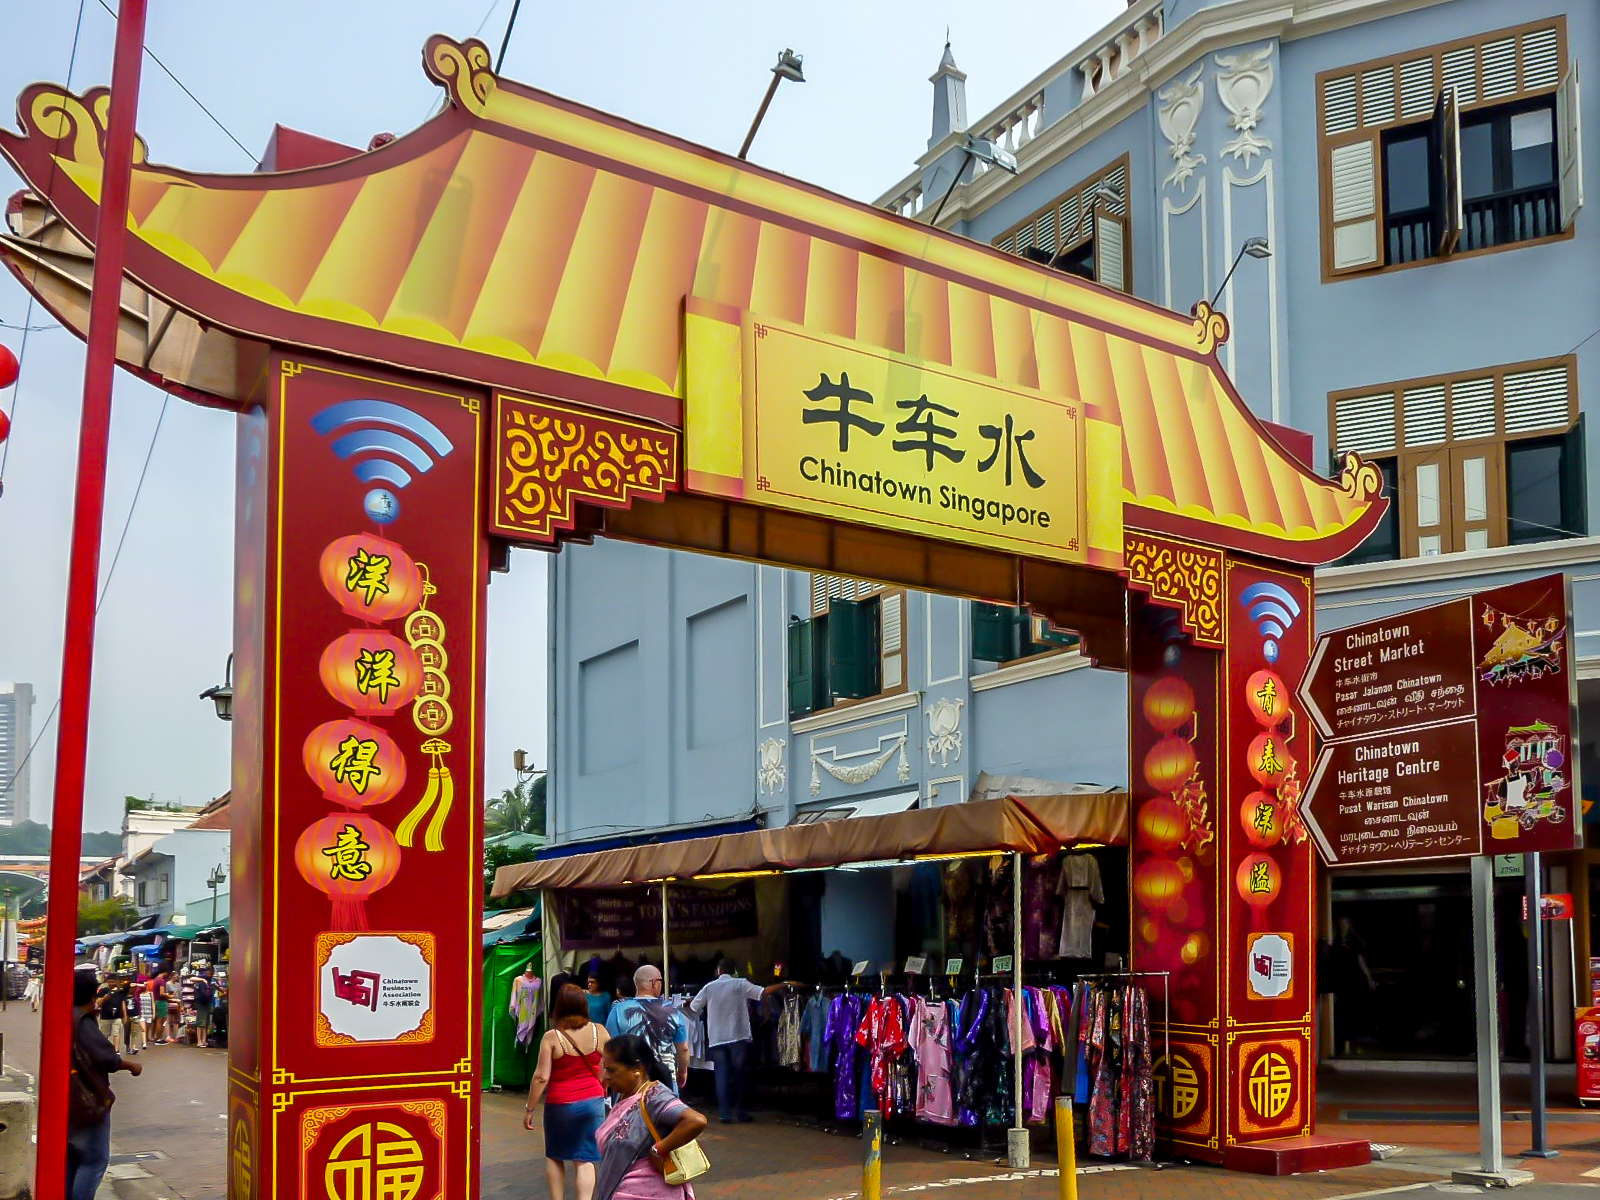 Direction Chinatown